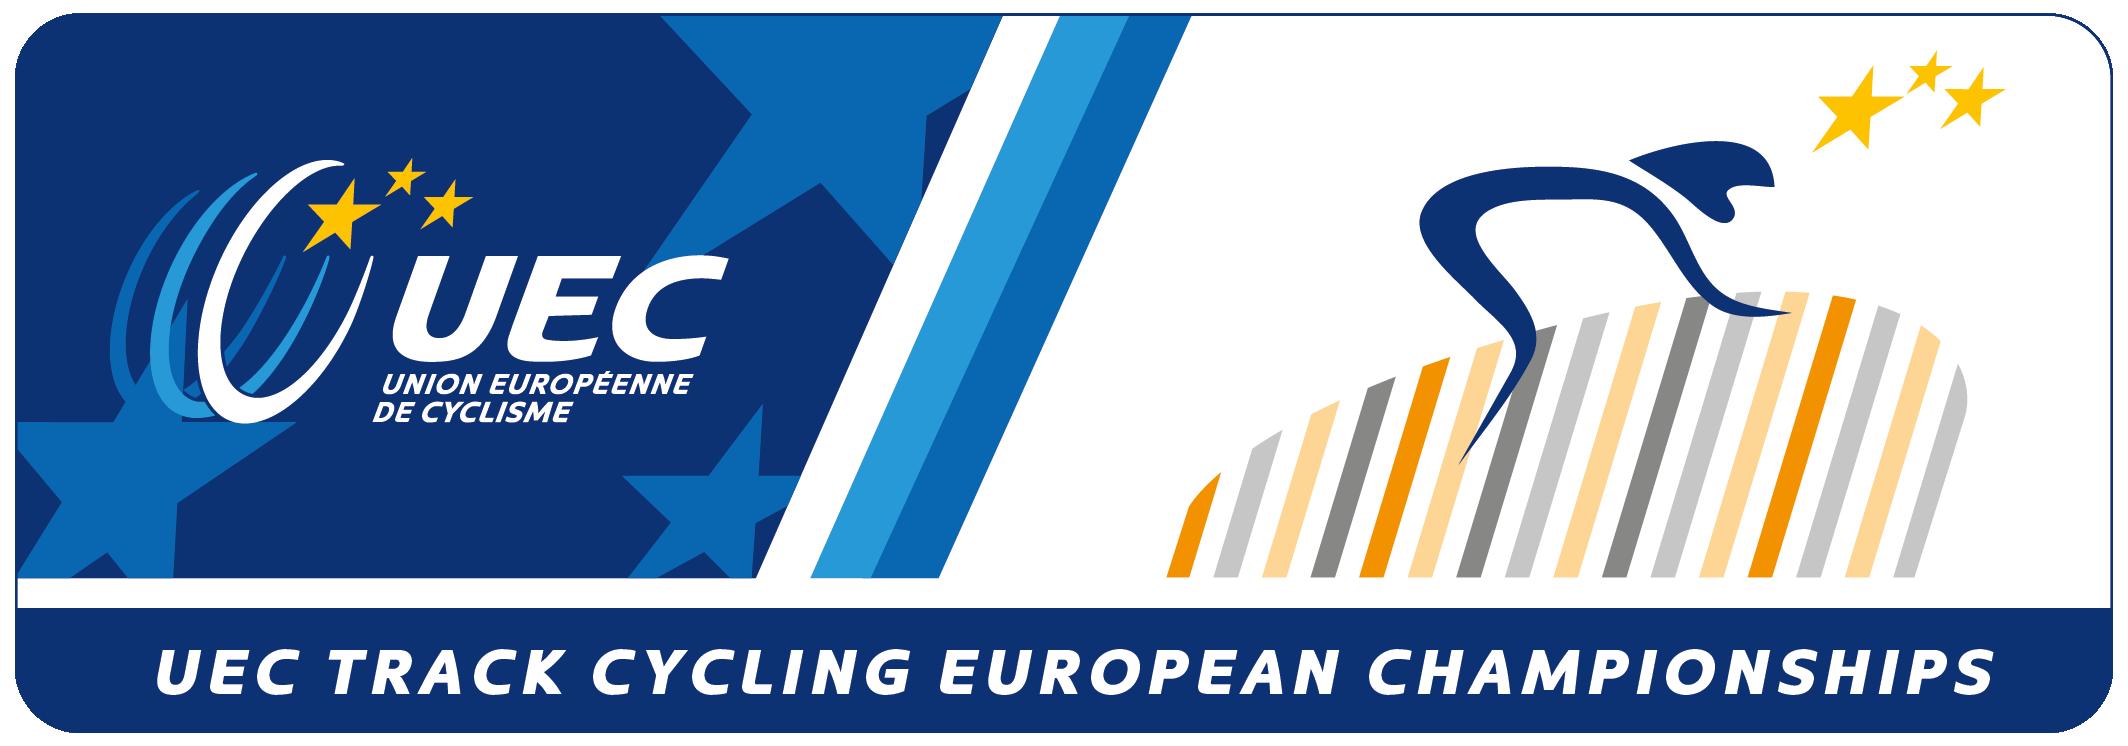 2021 UEC TRACK JUNIORS & U23 EUROPEAN CHAMPIONSHIPS